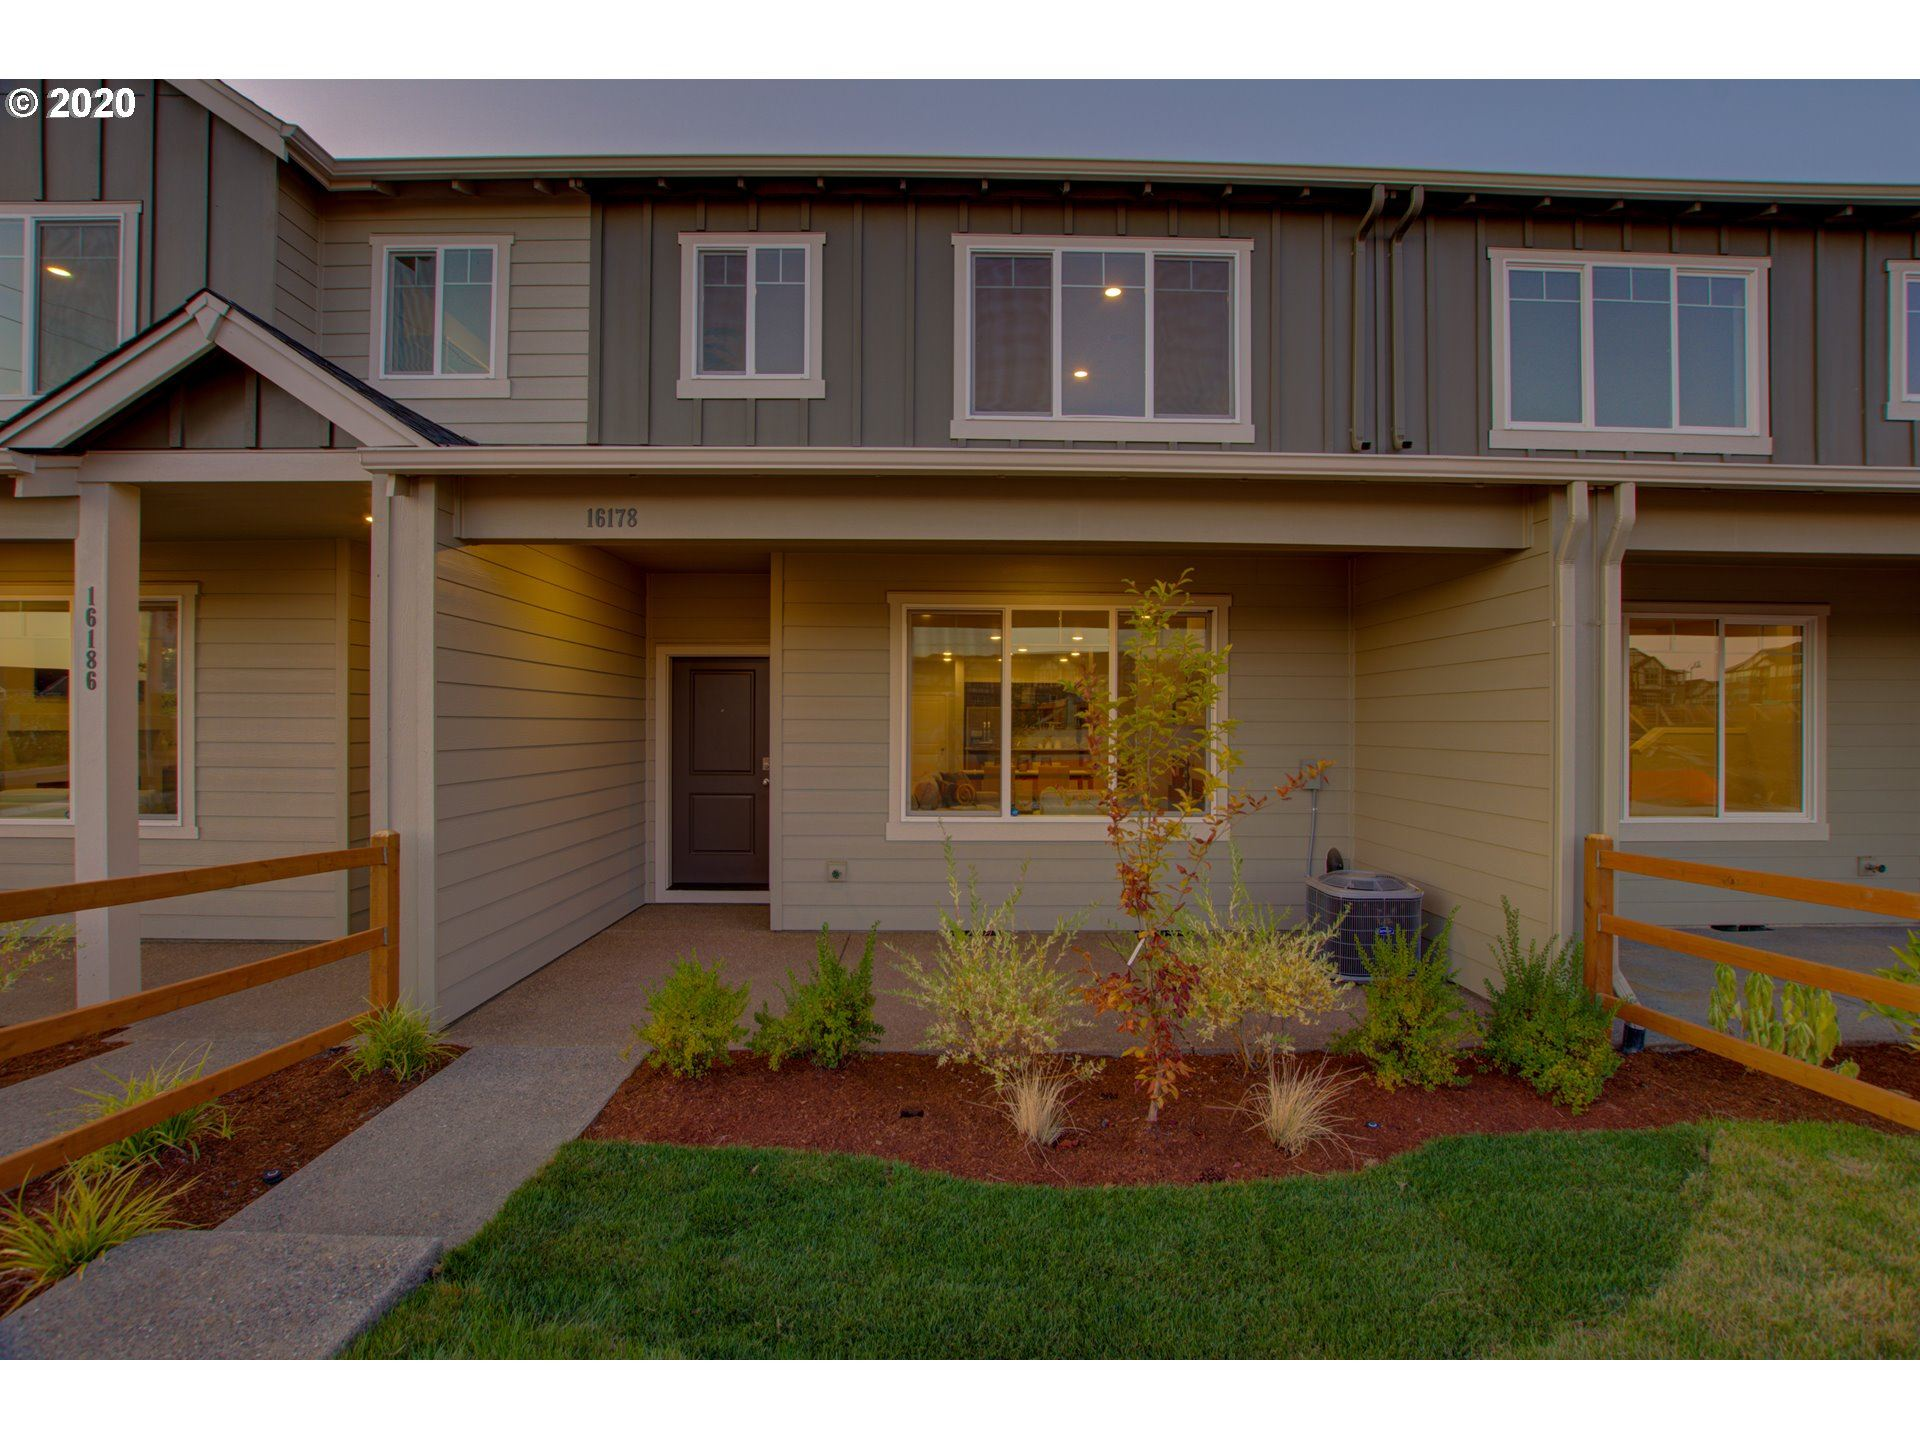 16108 NW PRISTINE LN, Portland, OR 97229 - MLS#: 20261602